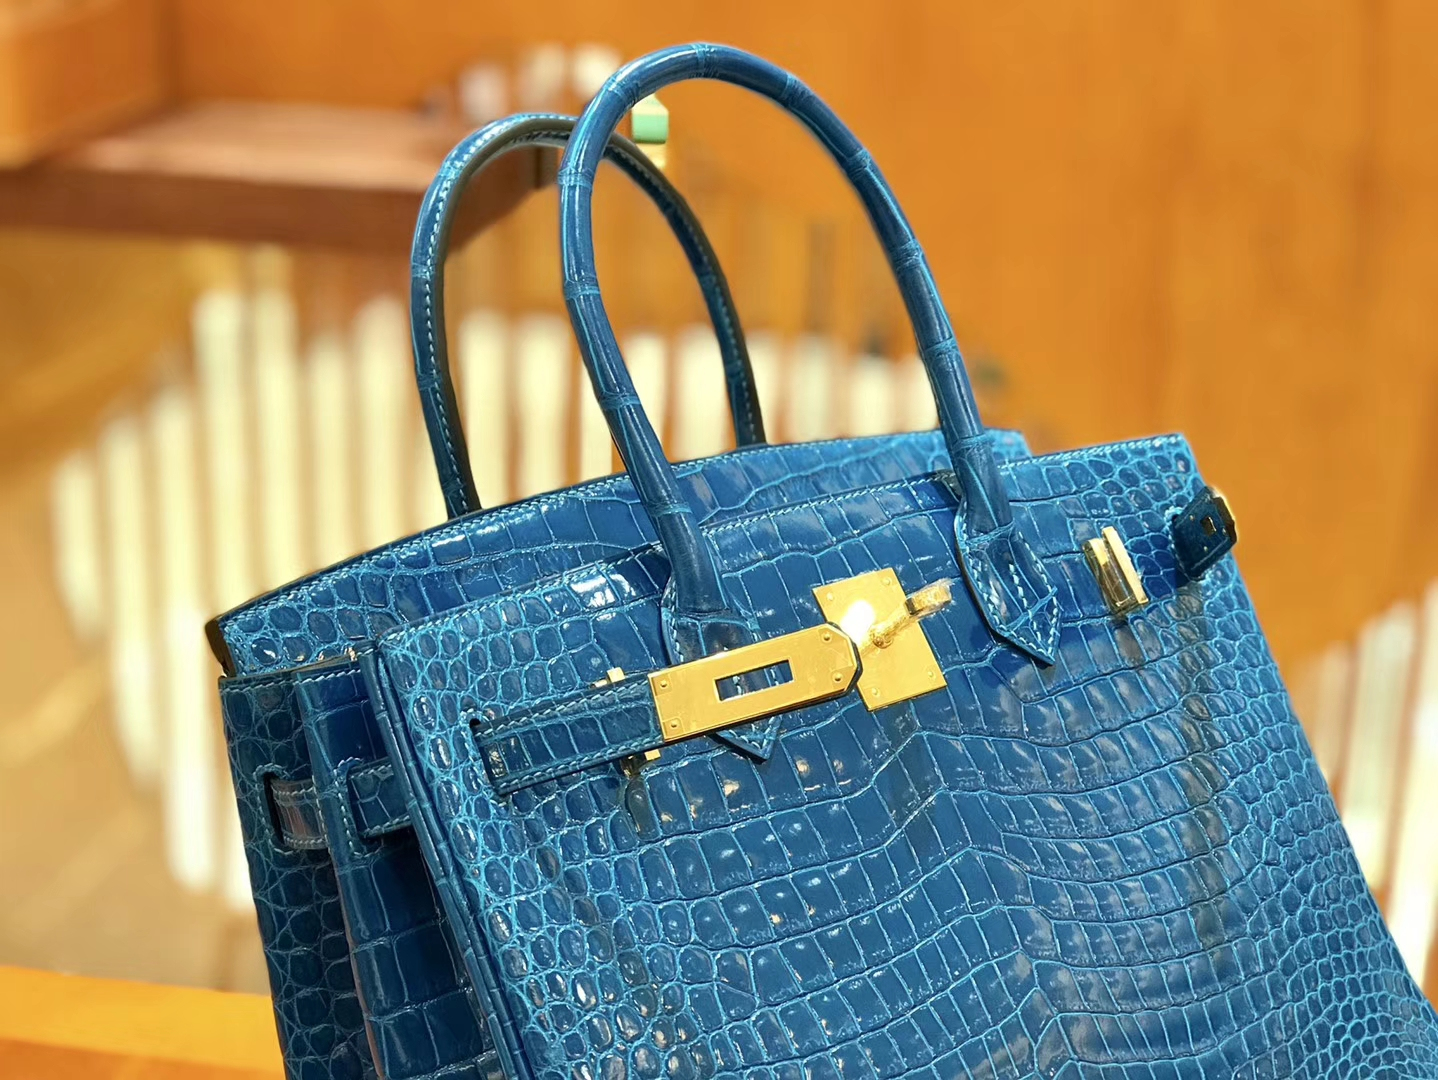 Hermès(爱马仕)Birkin 铂金包 倒V 伊滋密尔蓝 湾鳄 25cm